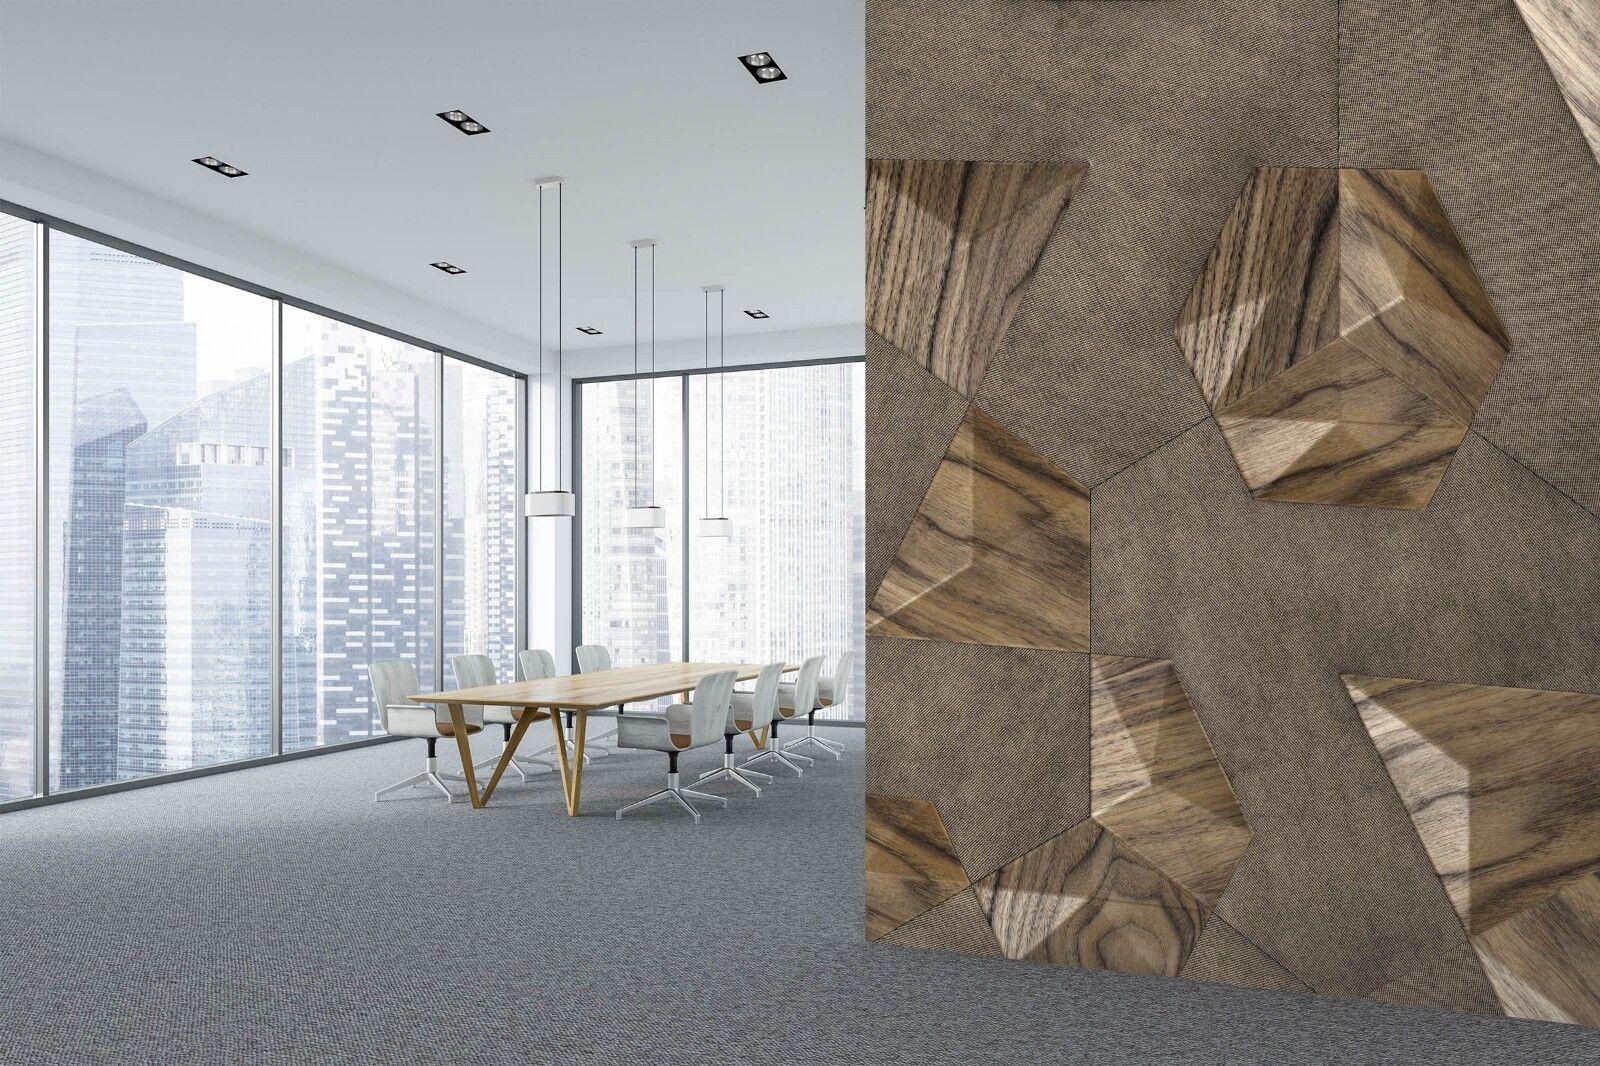 3D Stereoscopic Bump 94 Texture Tiles Marble Wall Paper Decal Wallpaper Mural AJ